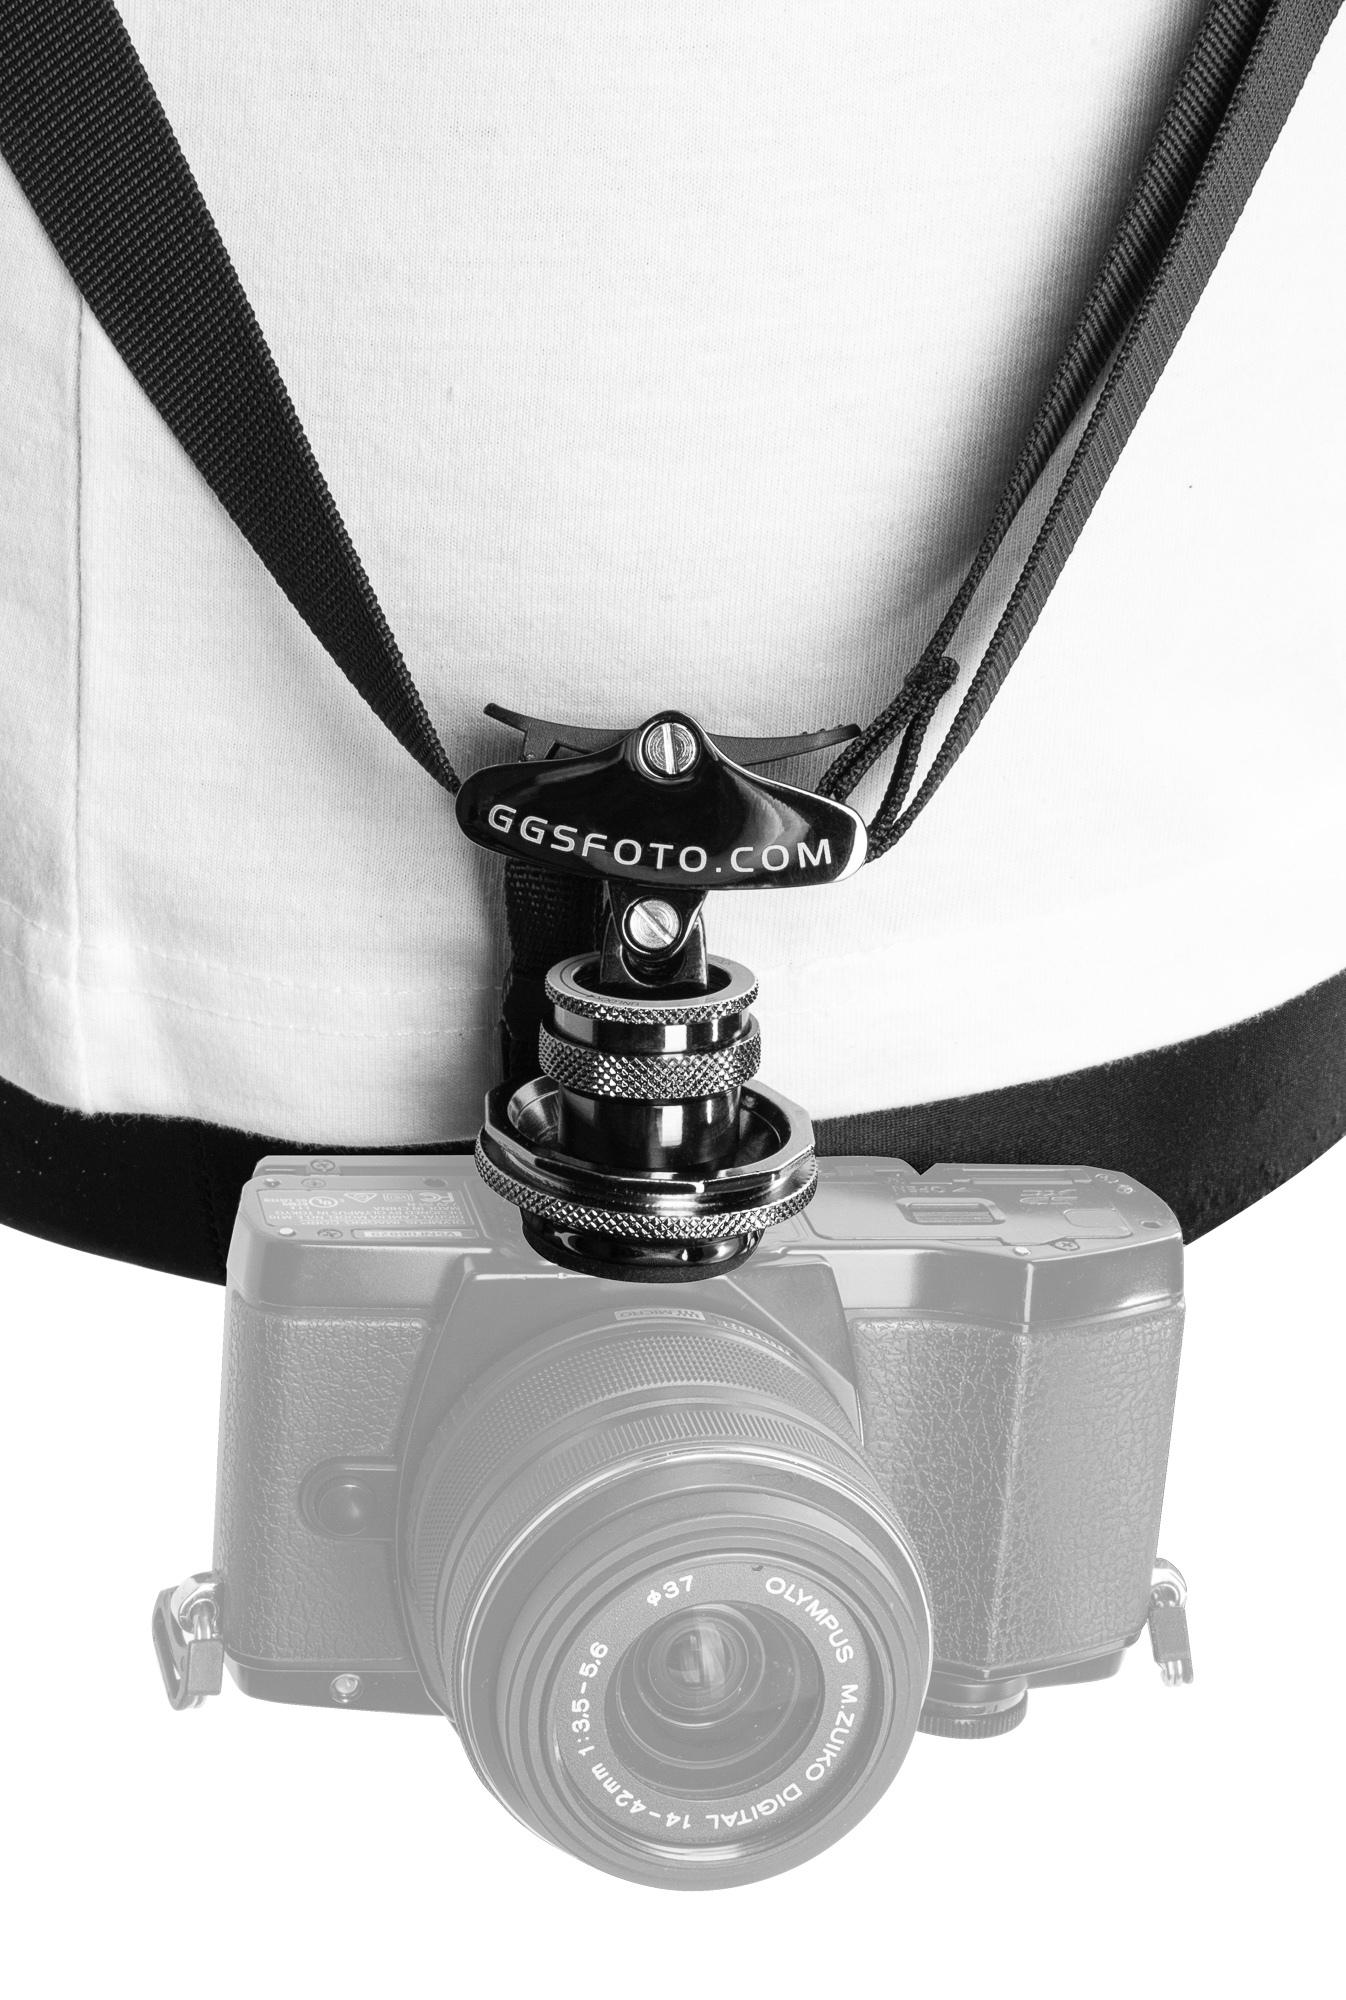 GGS Fotospeed F4 - pasek reporterski do aparatu